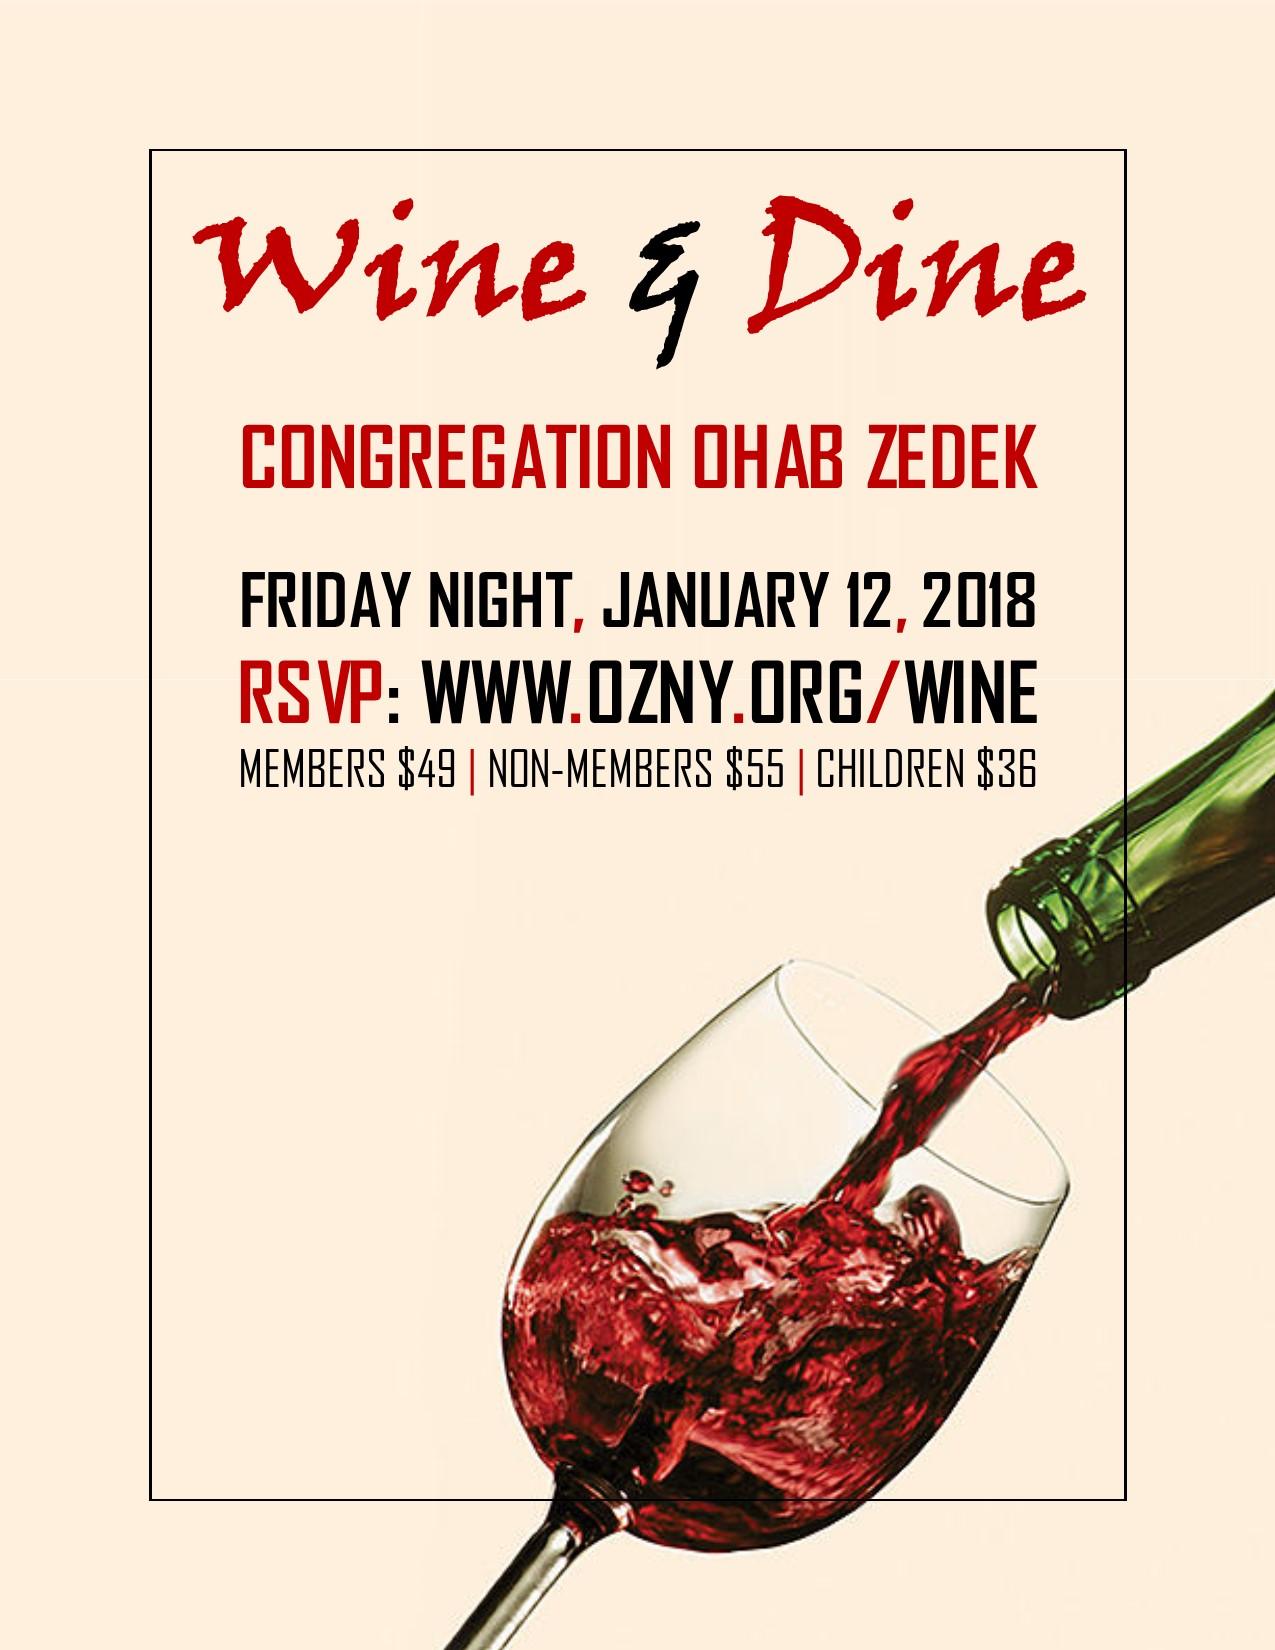 Wine-Dine-Jan-12-2018.jpg